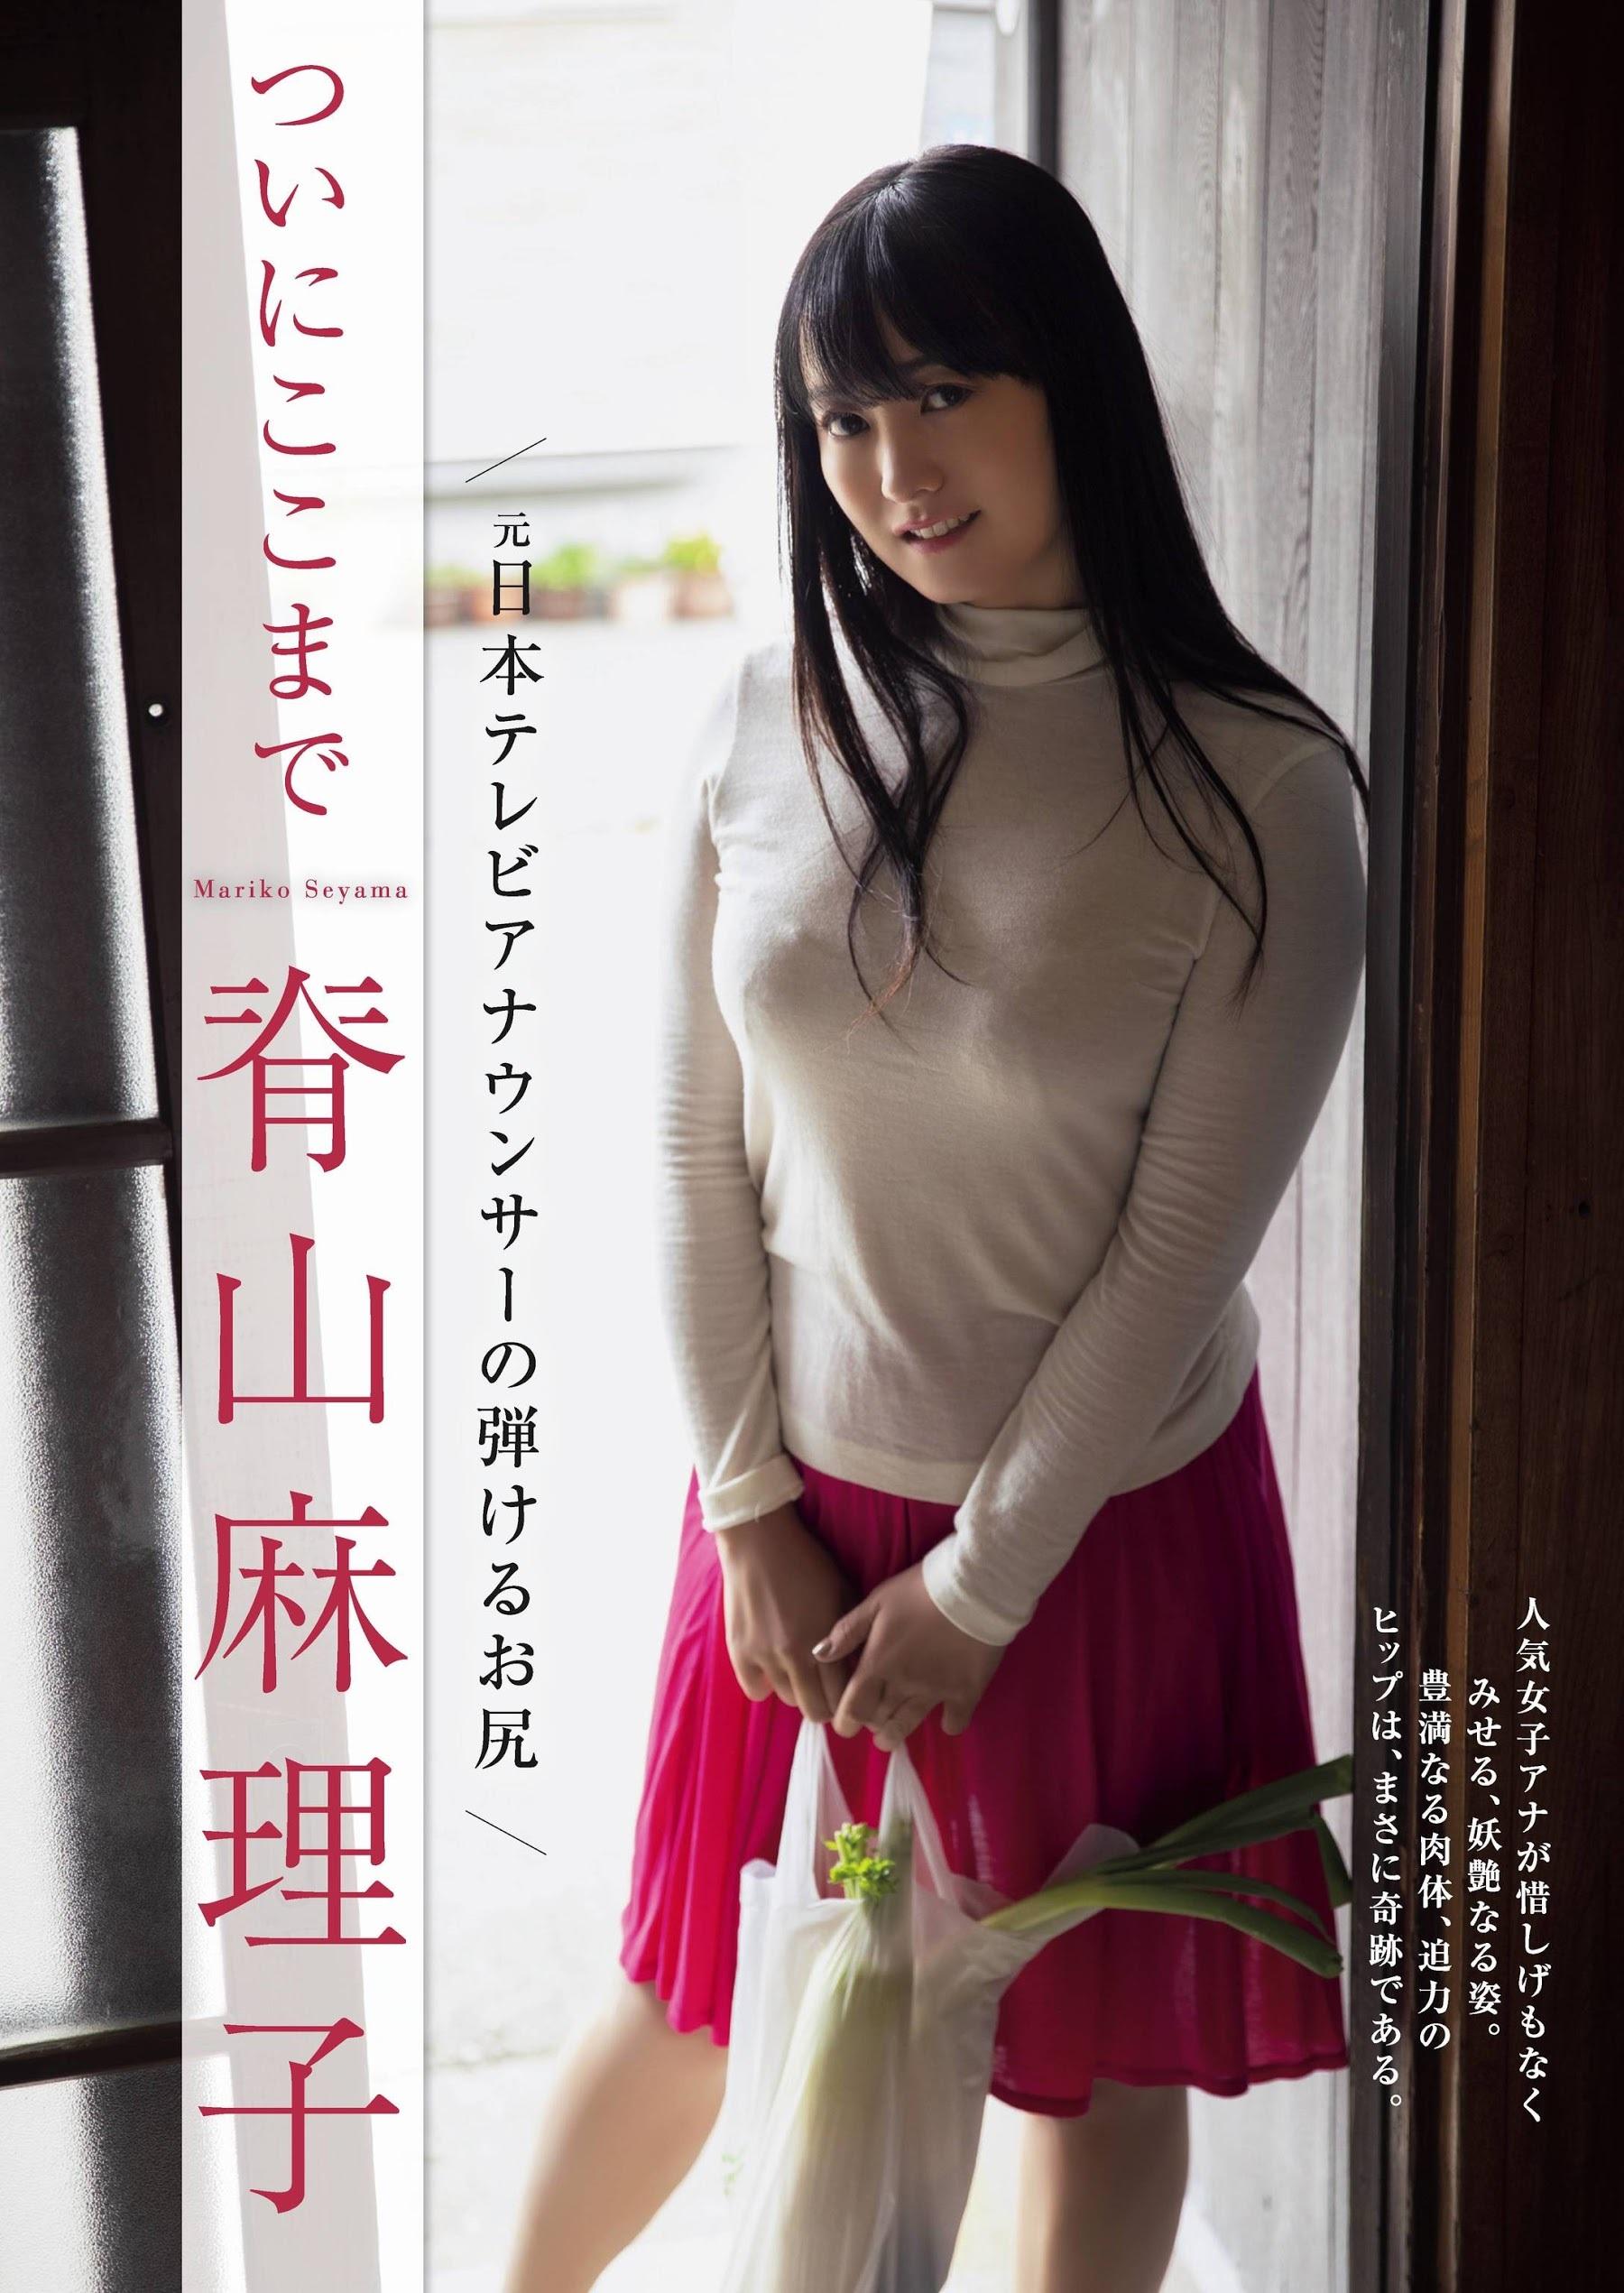 Former NTV announcers bouncy buttocksMariko Seyama 001